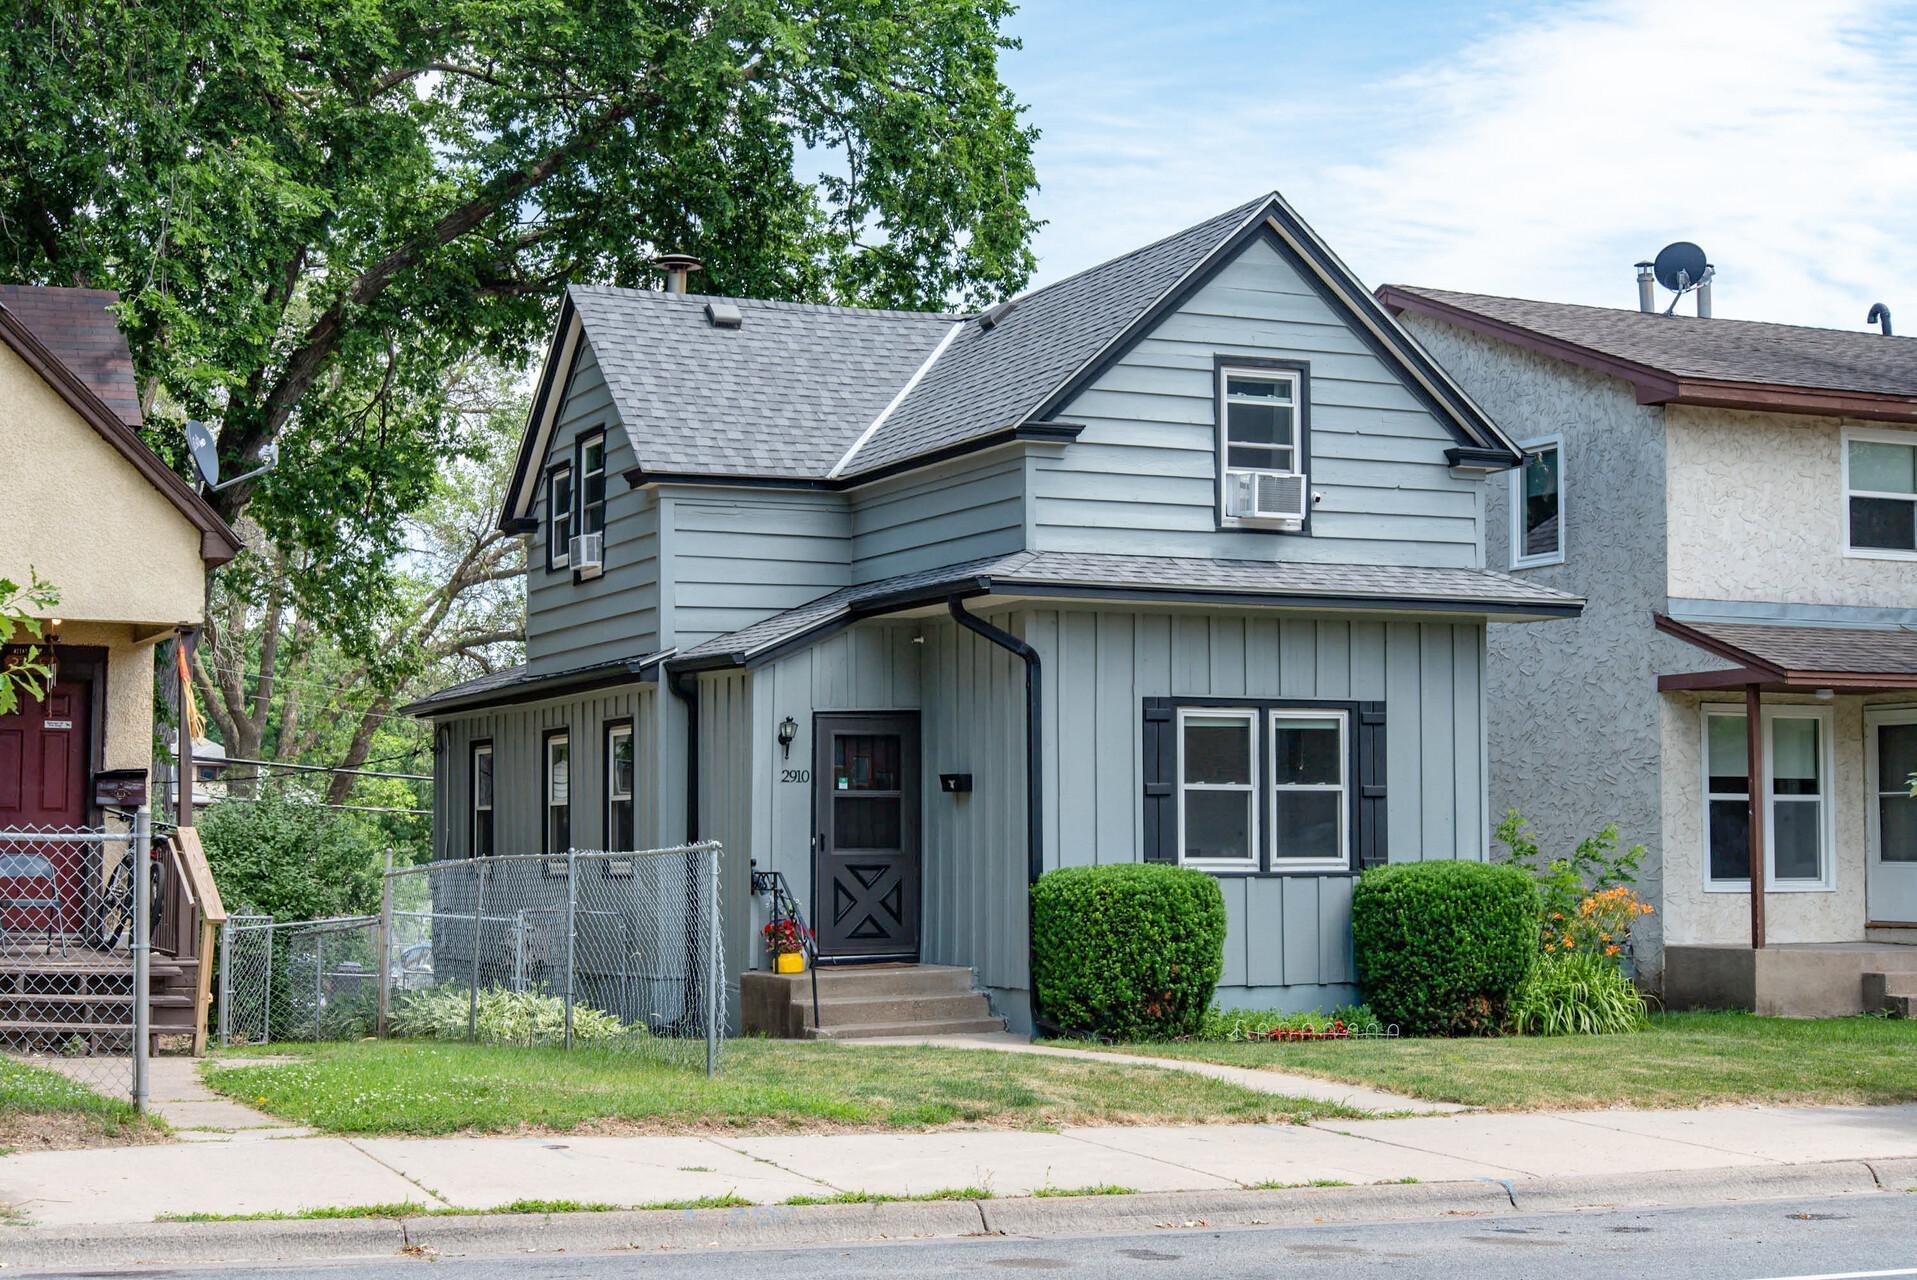 2910 Emerson N Property Photo - Minneapolis, MN real estate listing